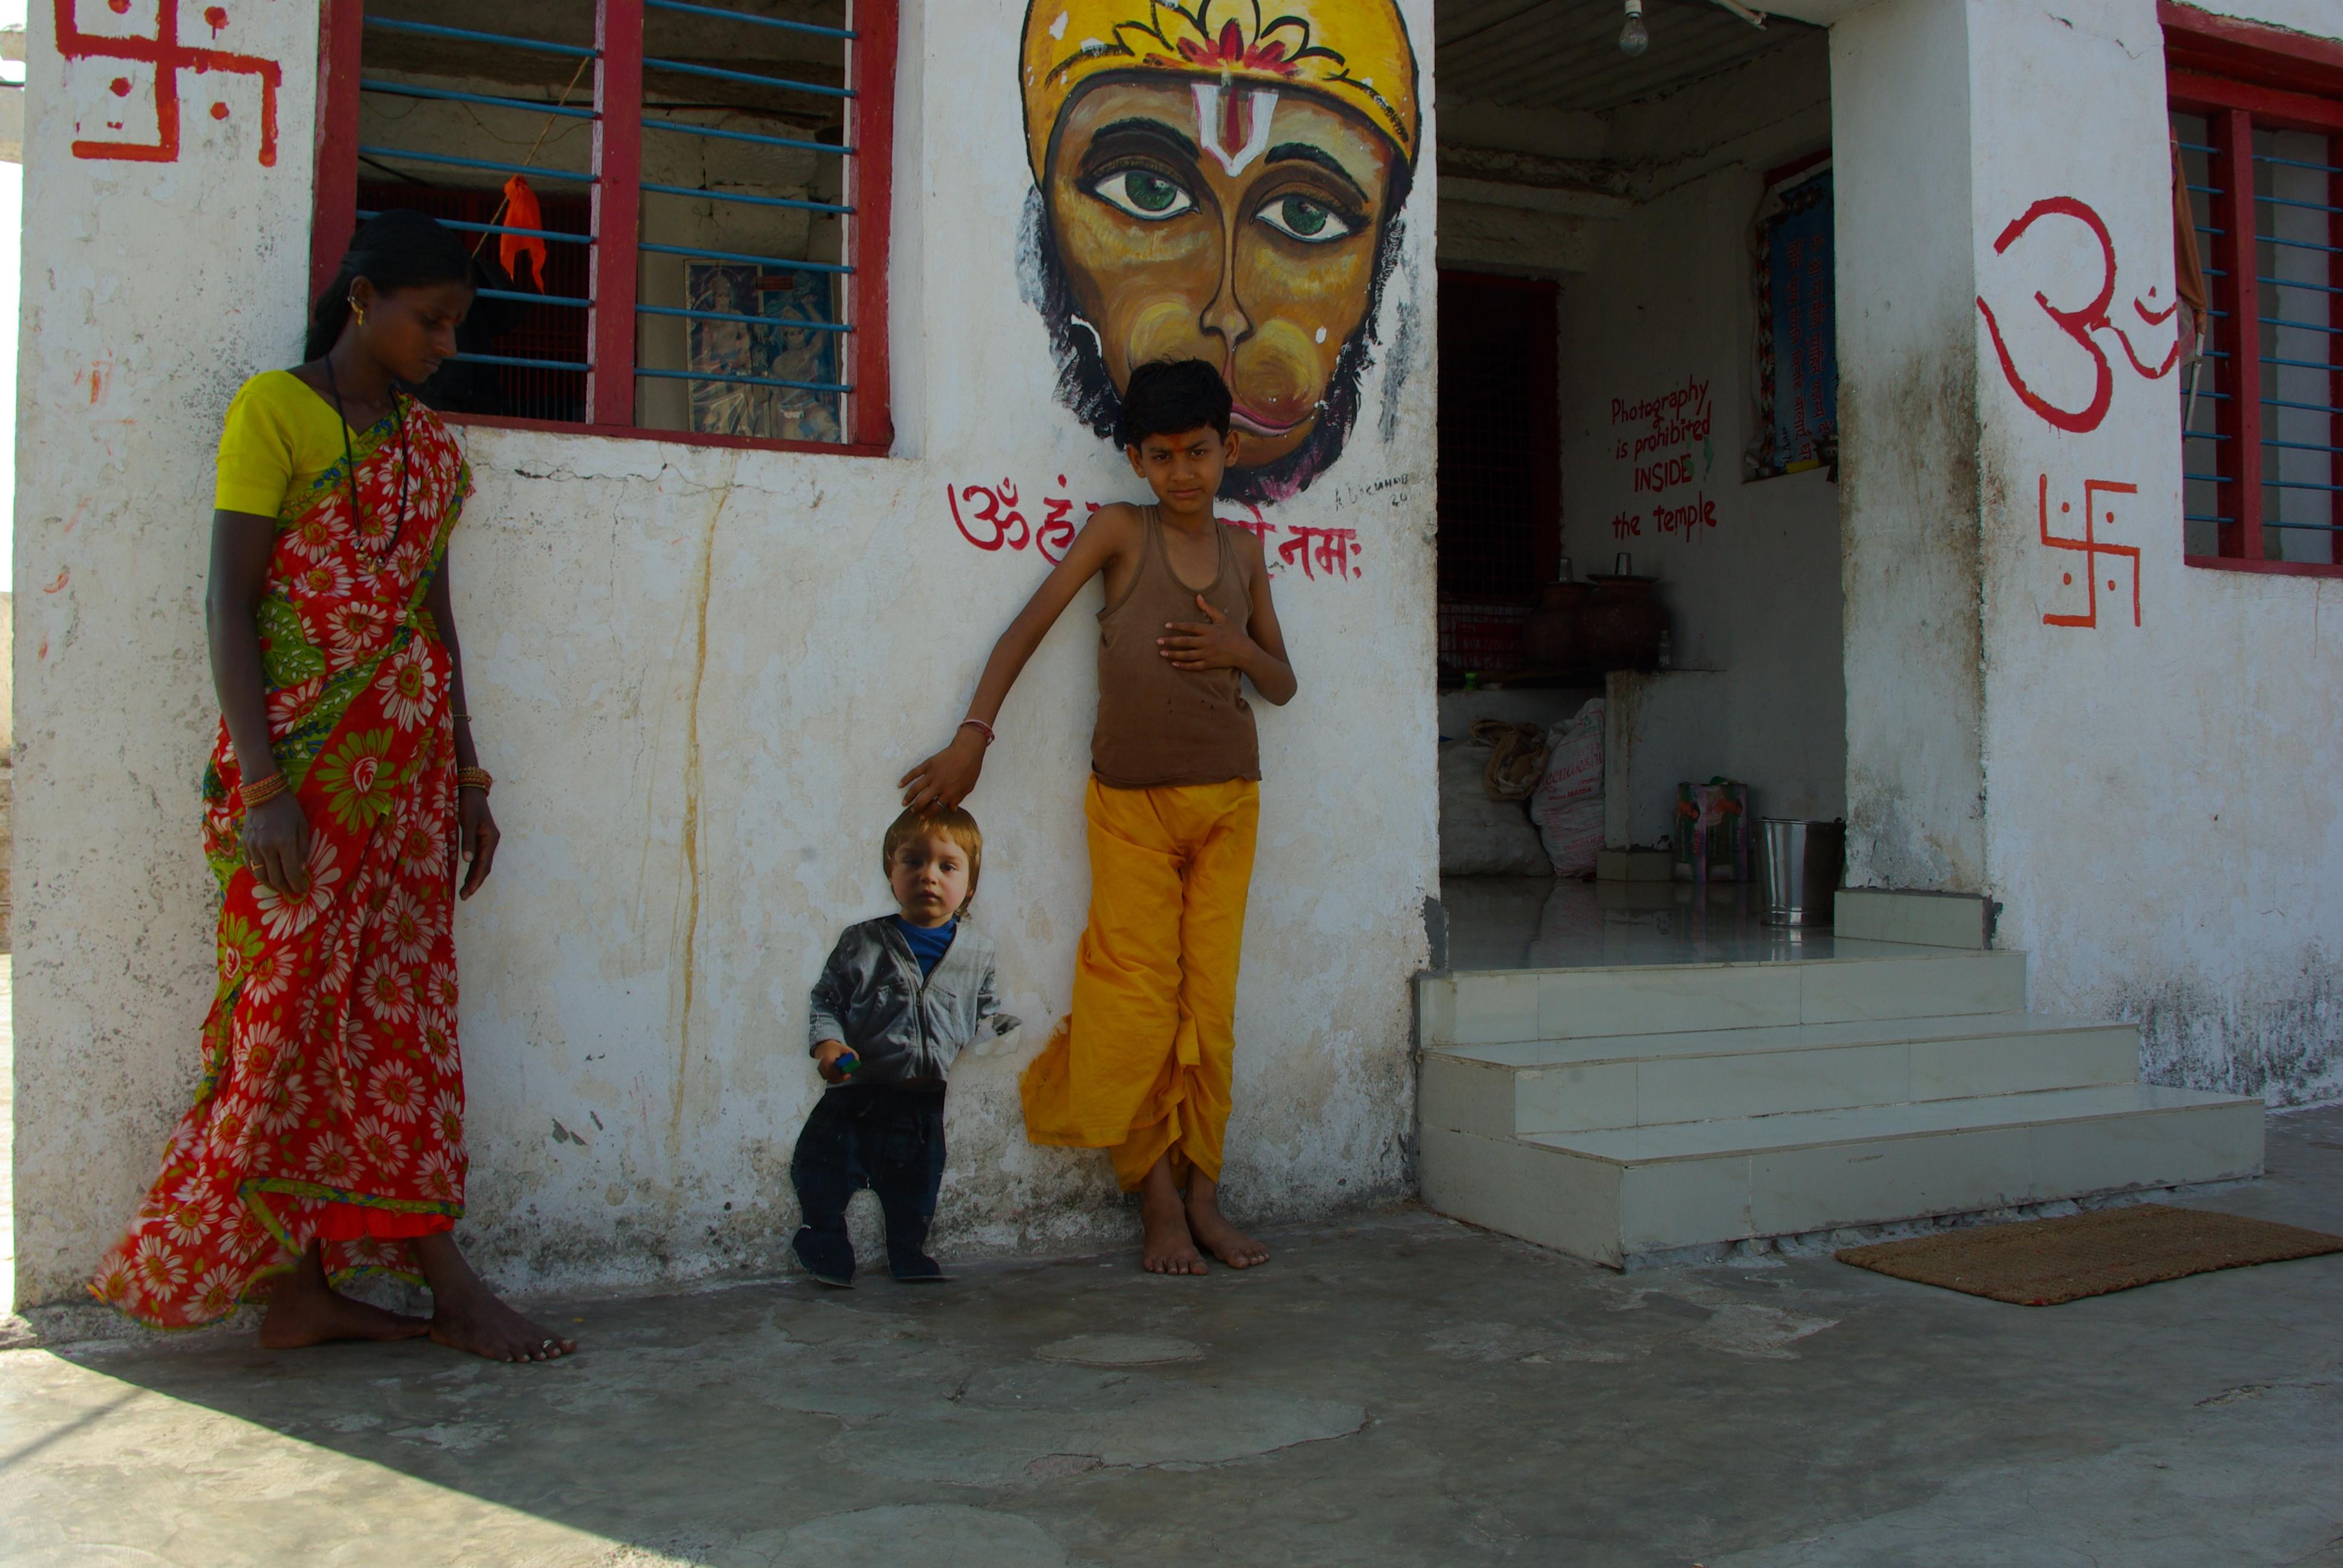 Brother in India, C-Print, 90 x 60 cm